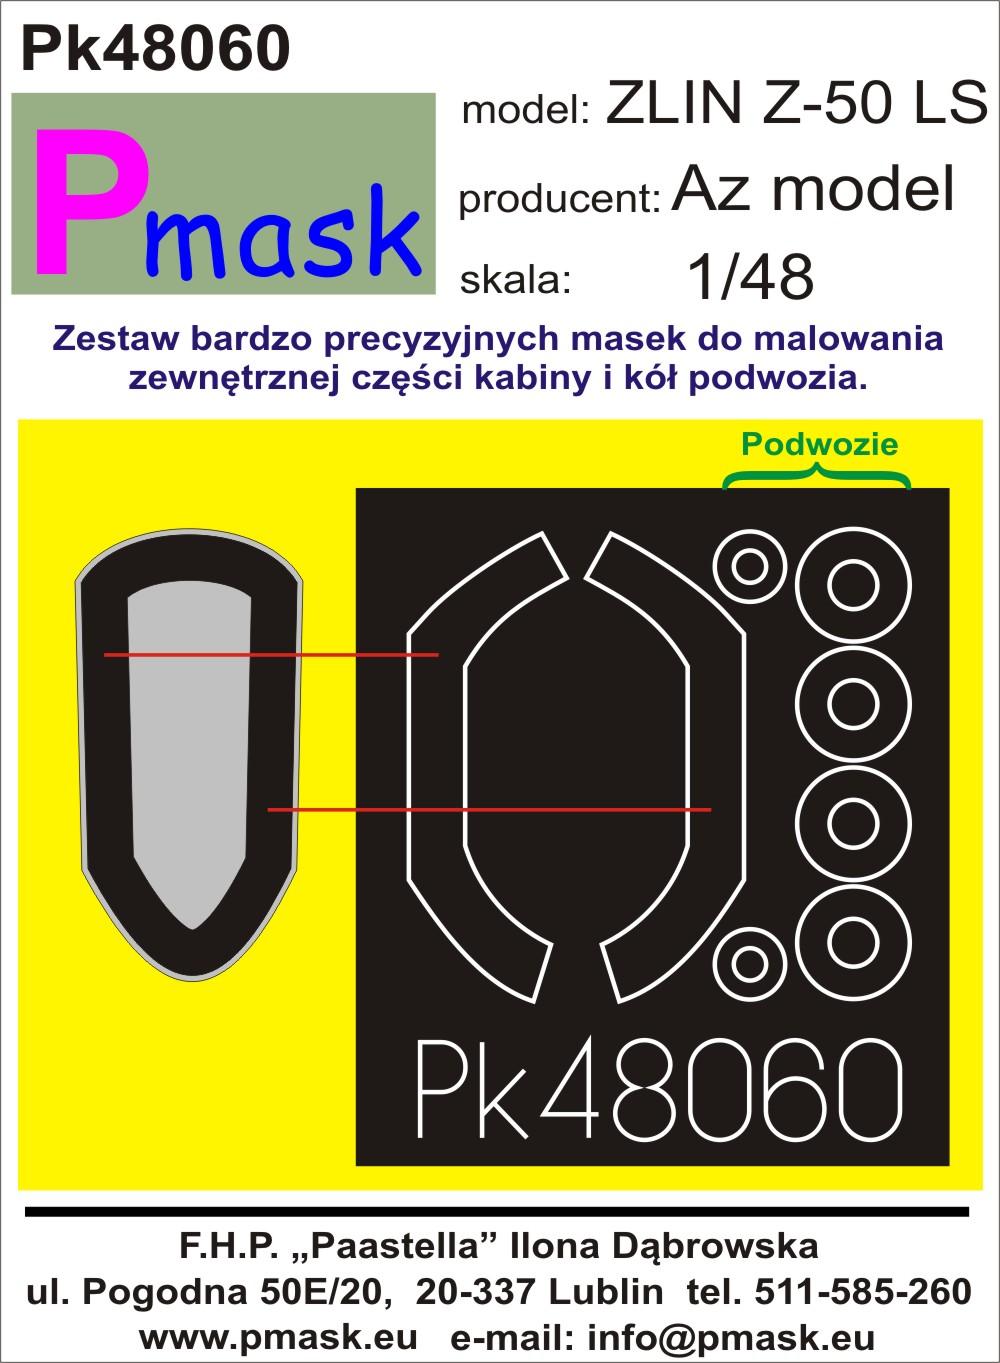 PK48060